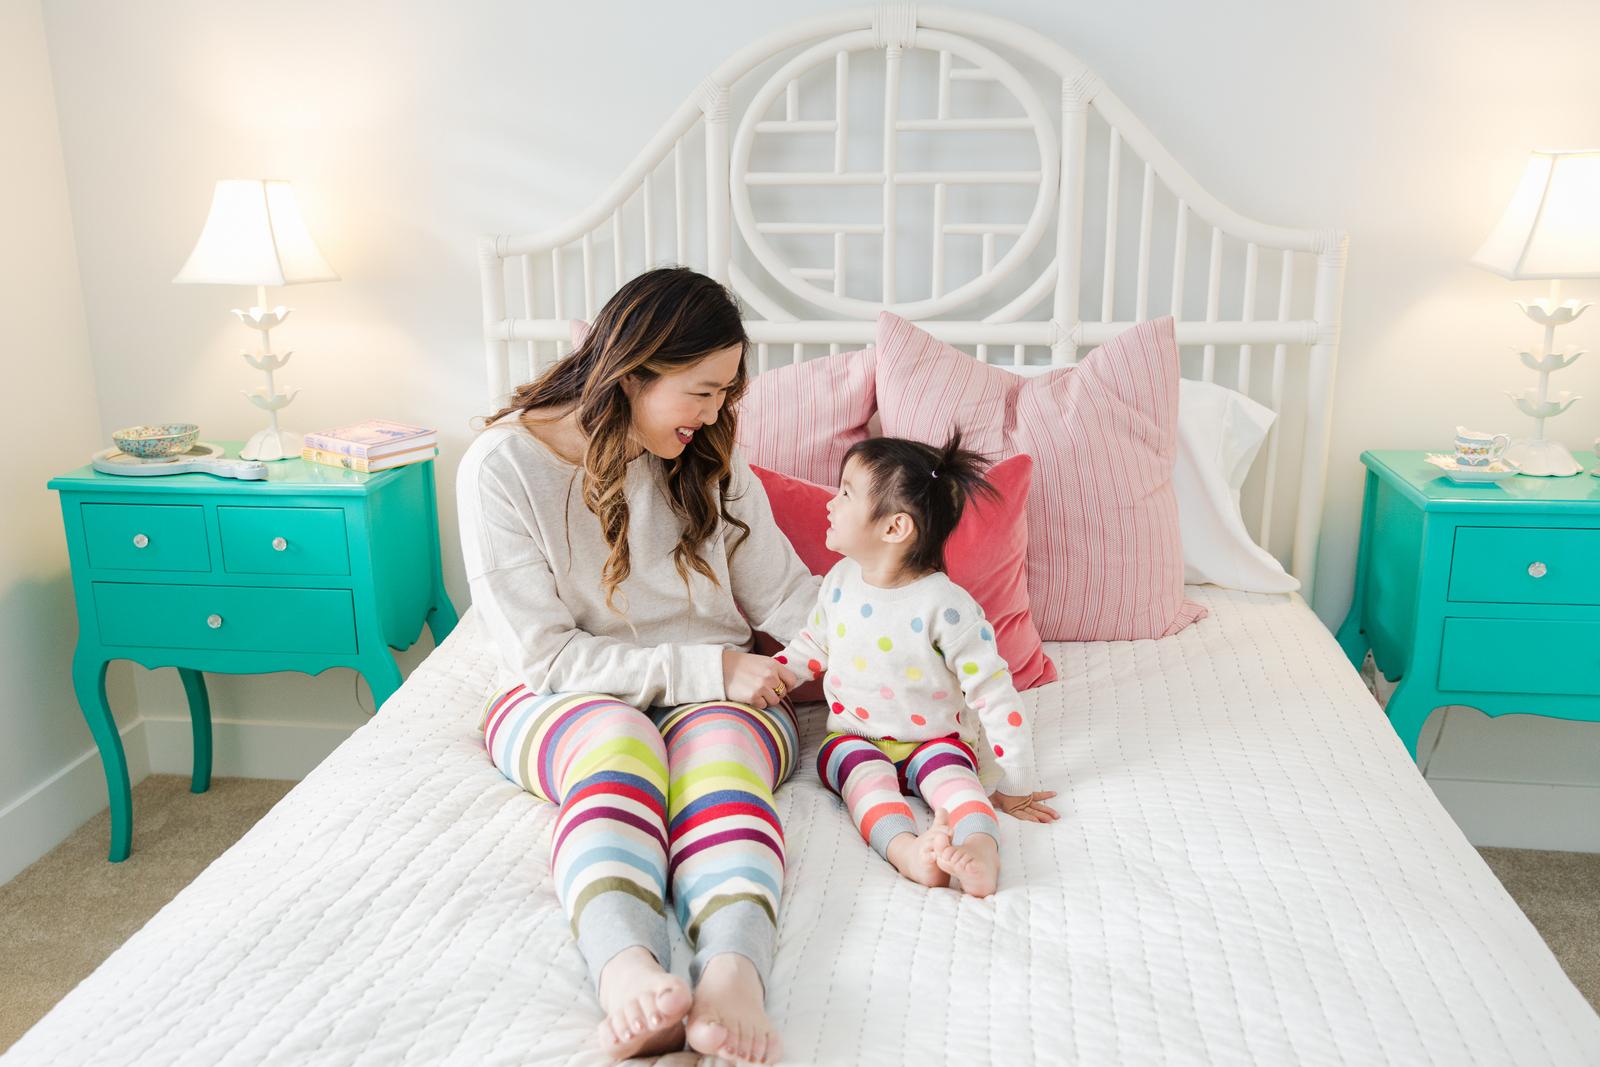 GAP sweater leggings: Mommy and Me loungewear